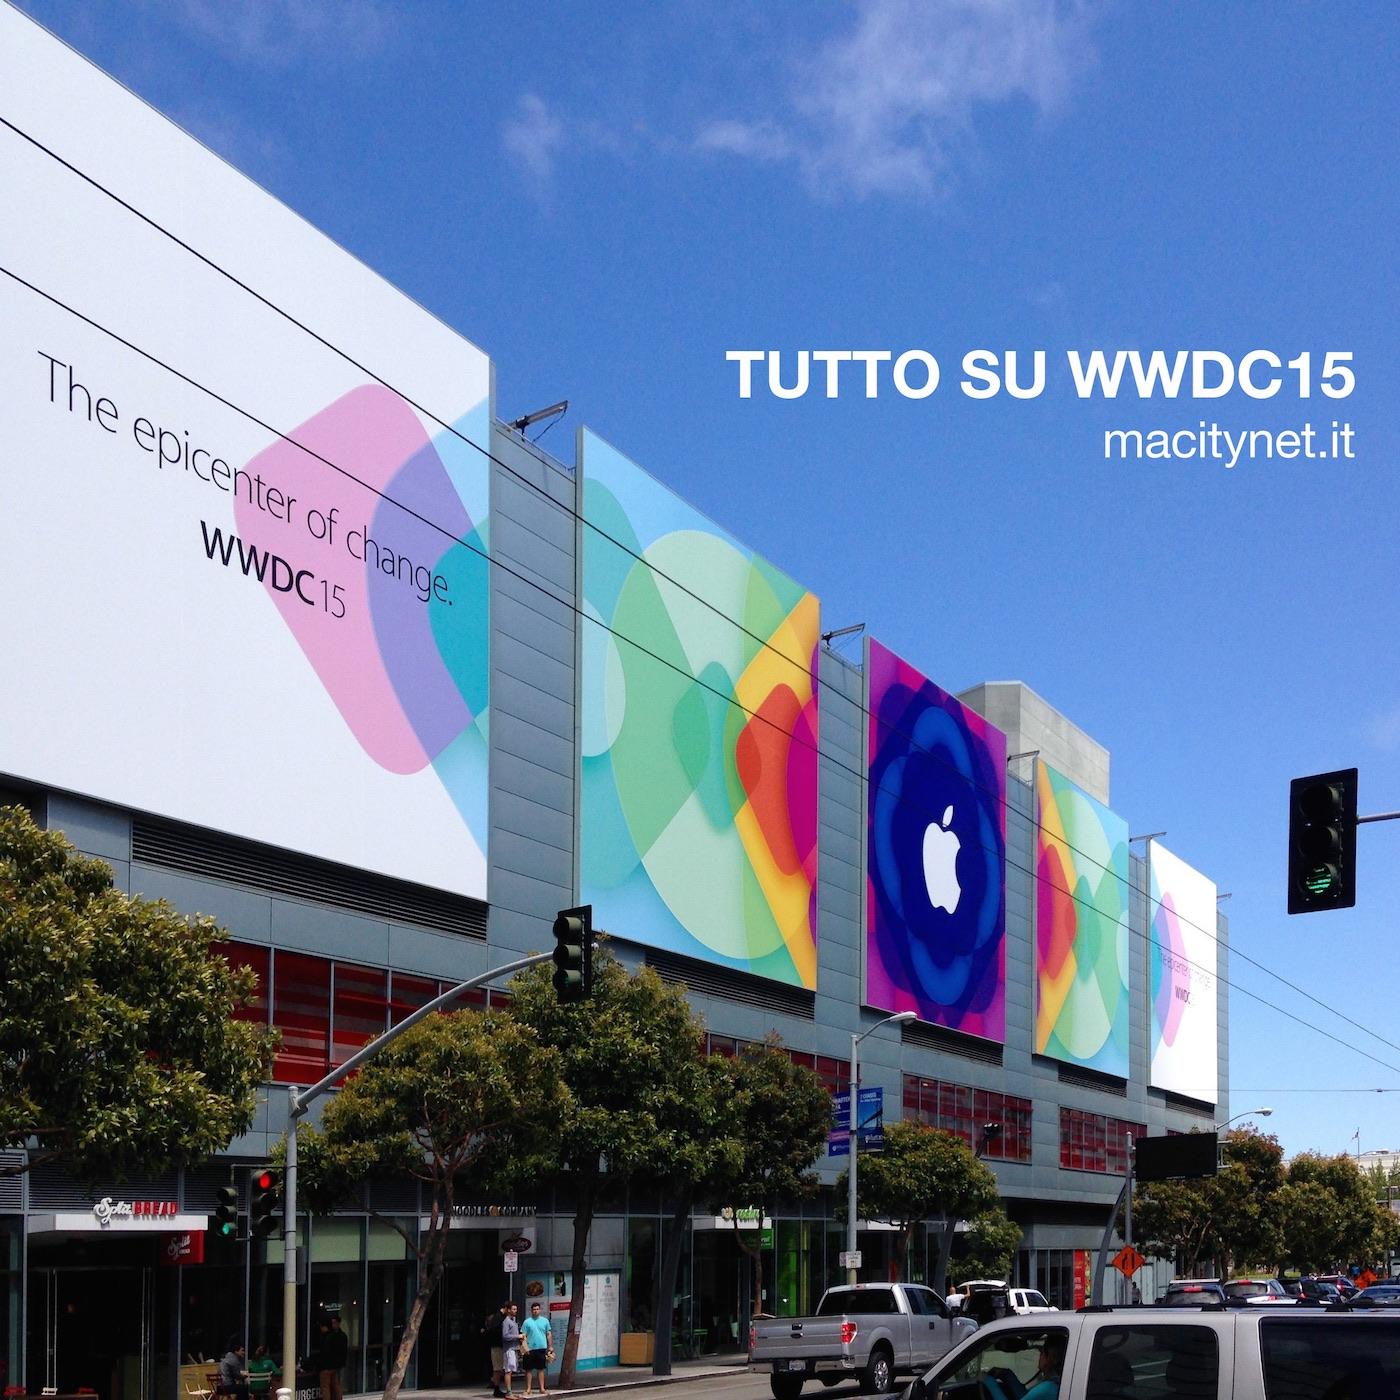 Tutta la WWDC15